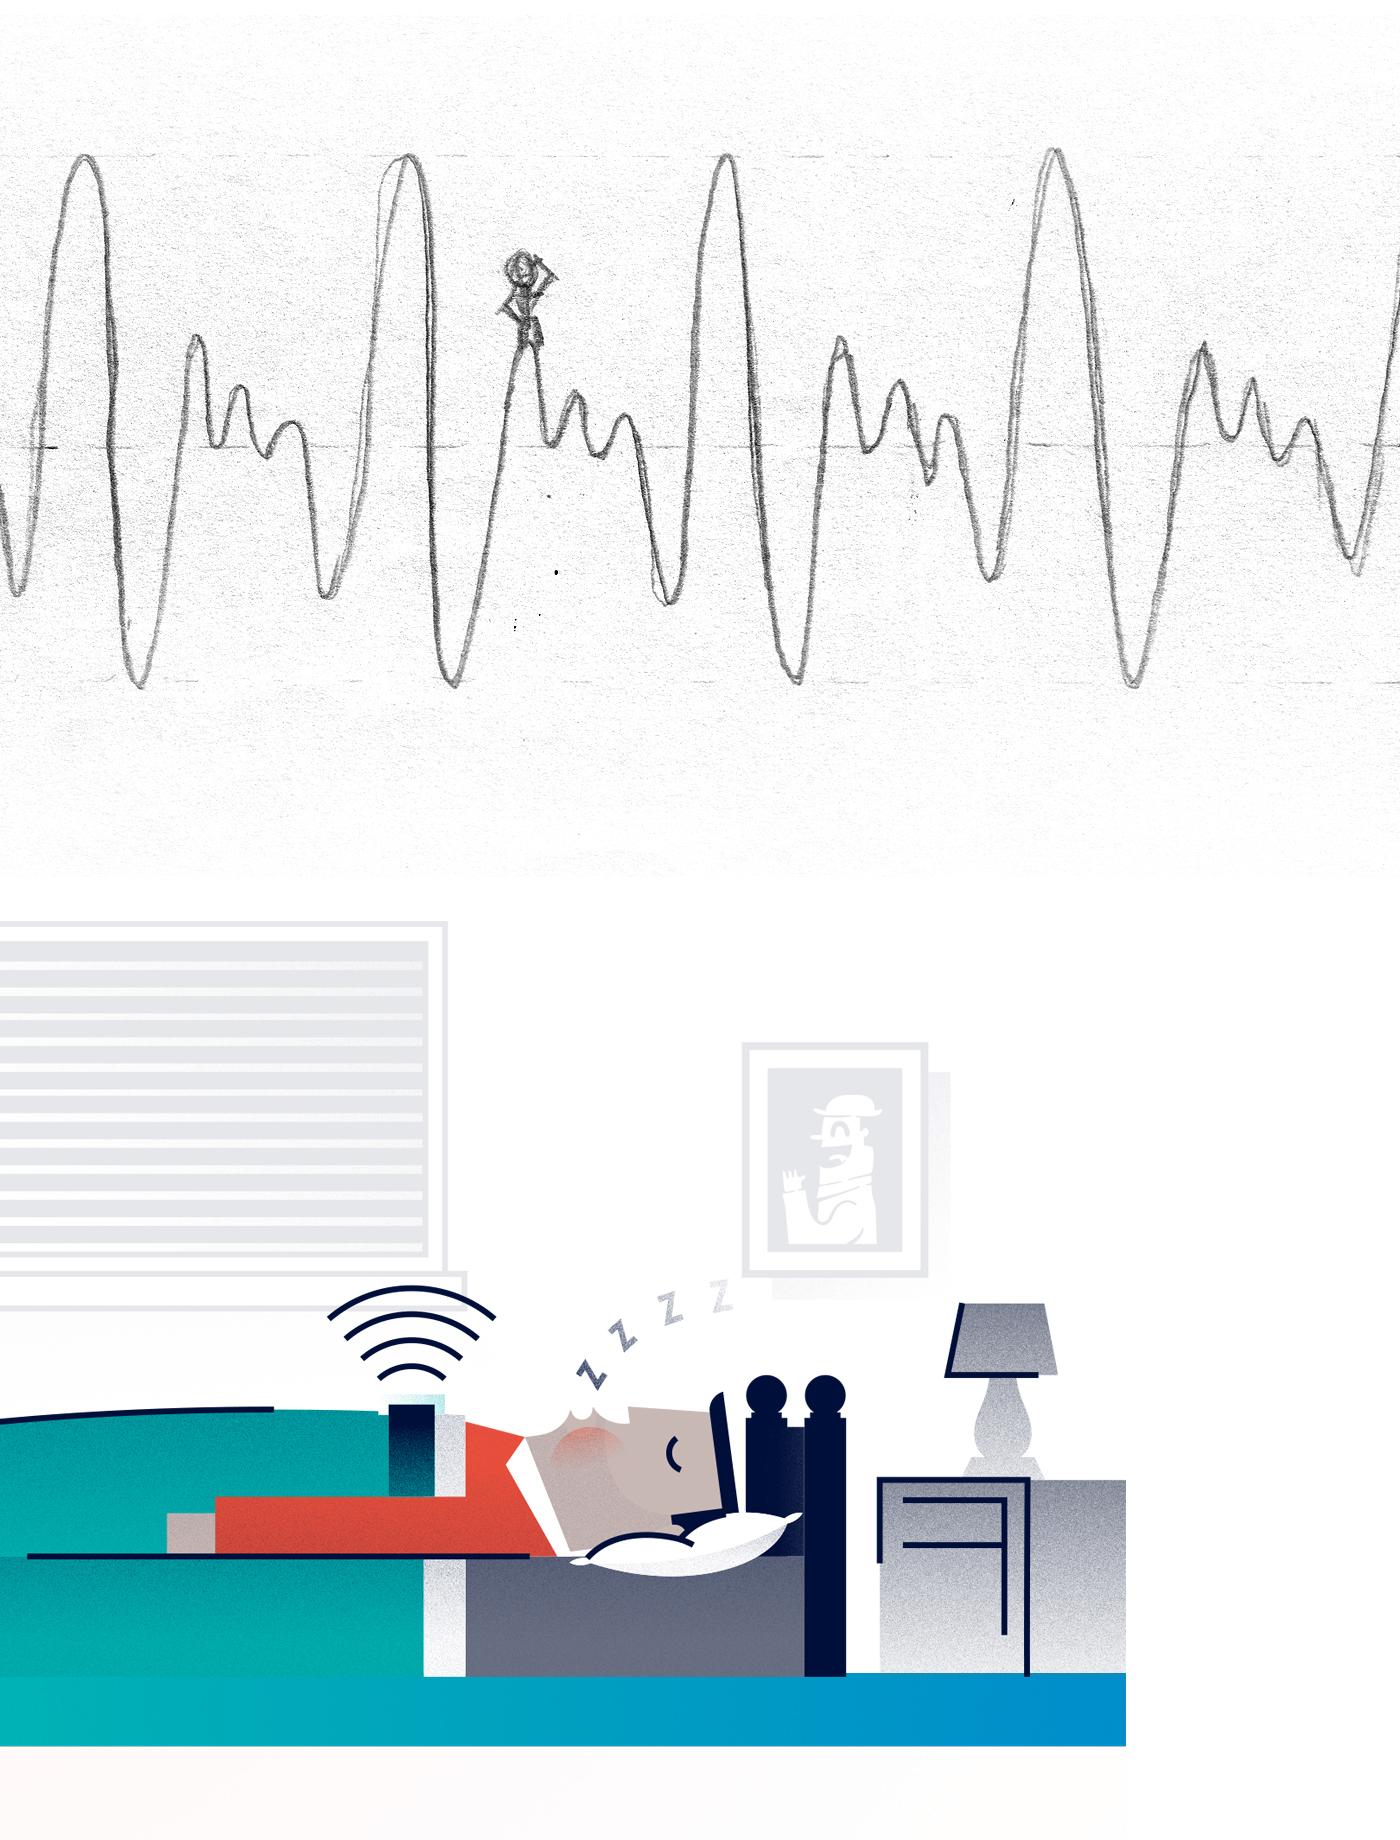 medicine,sleep,apnea,patient,hospital,clinic,Monitoring,story,system,bed